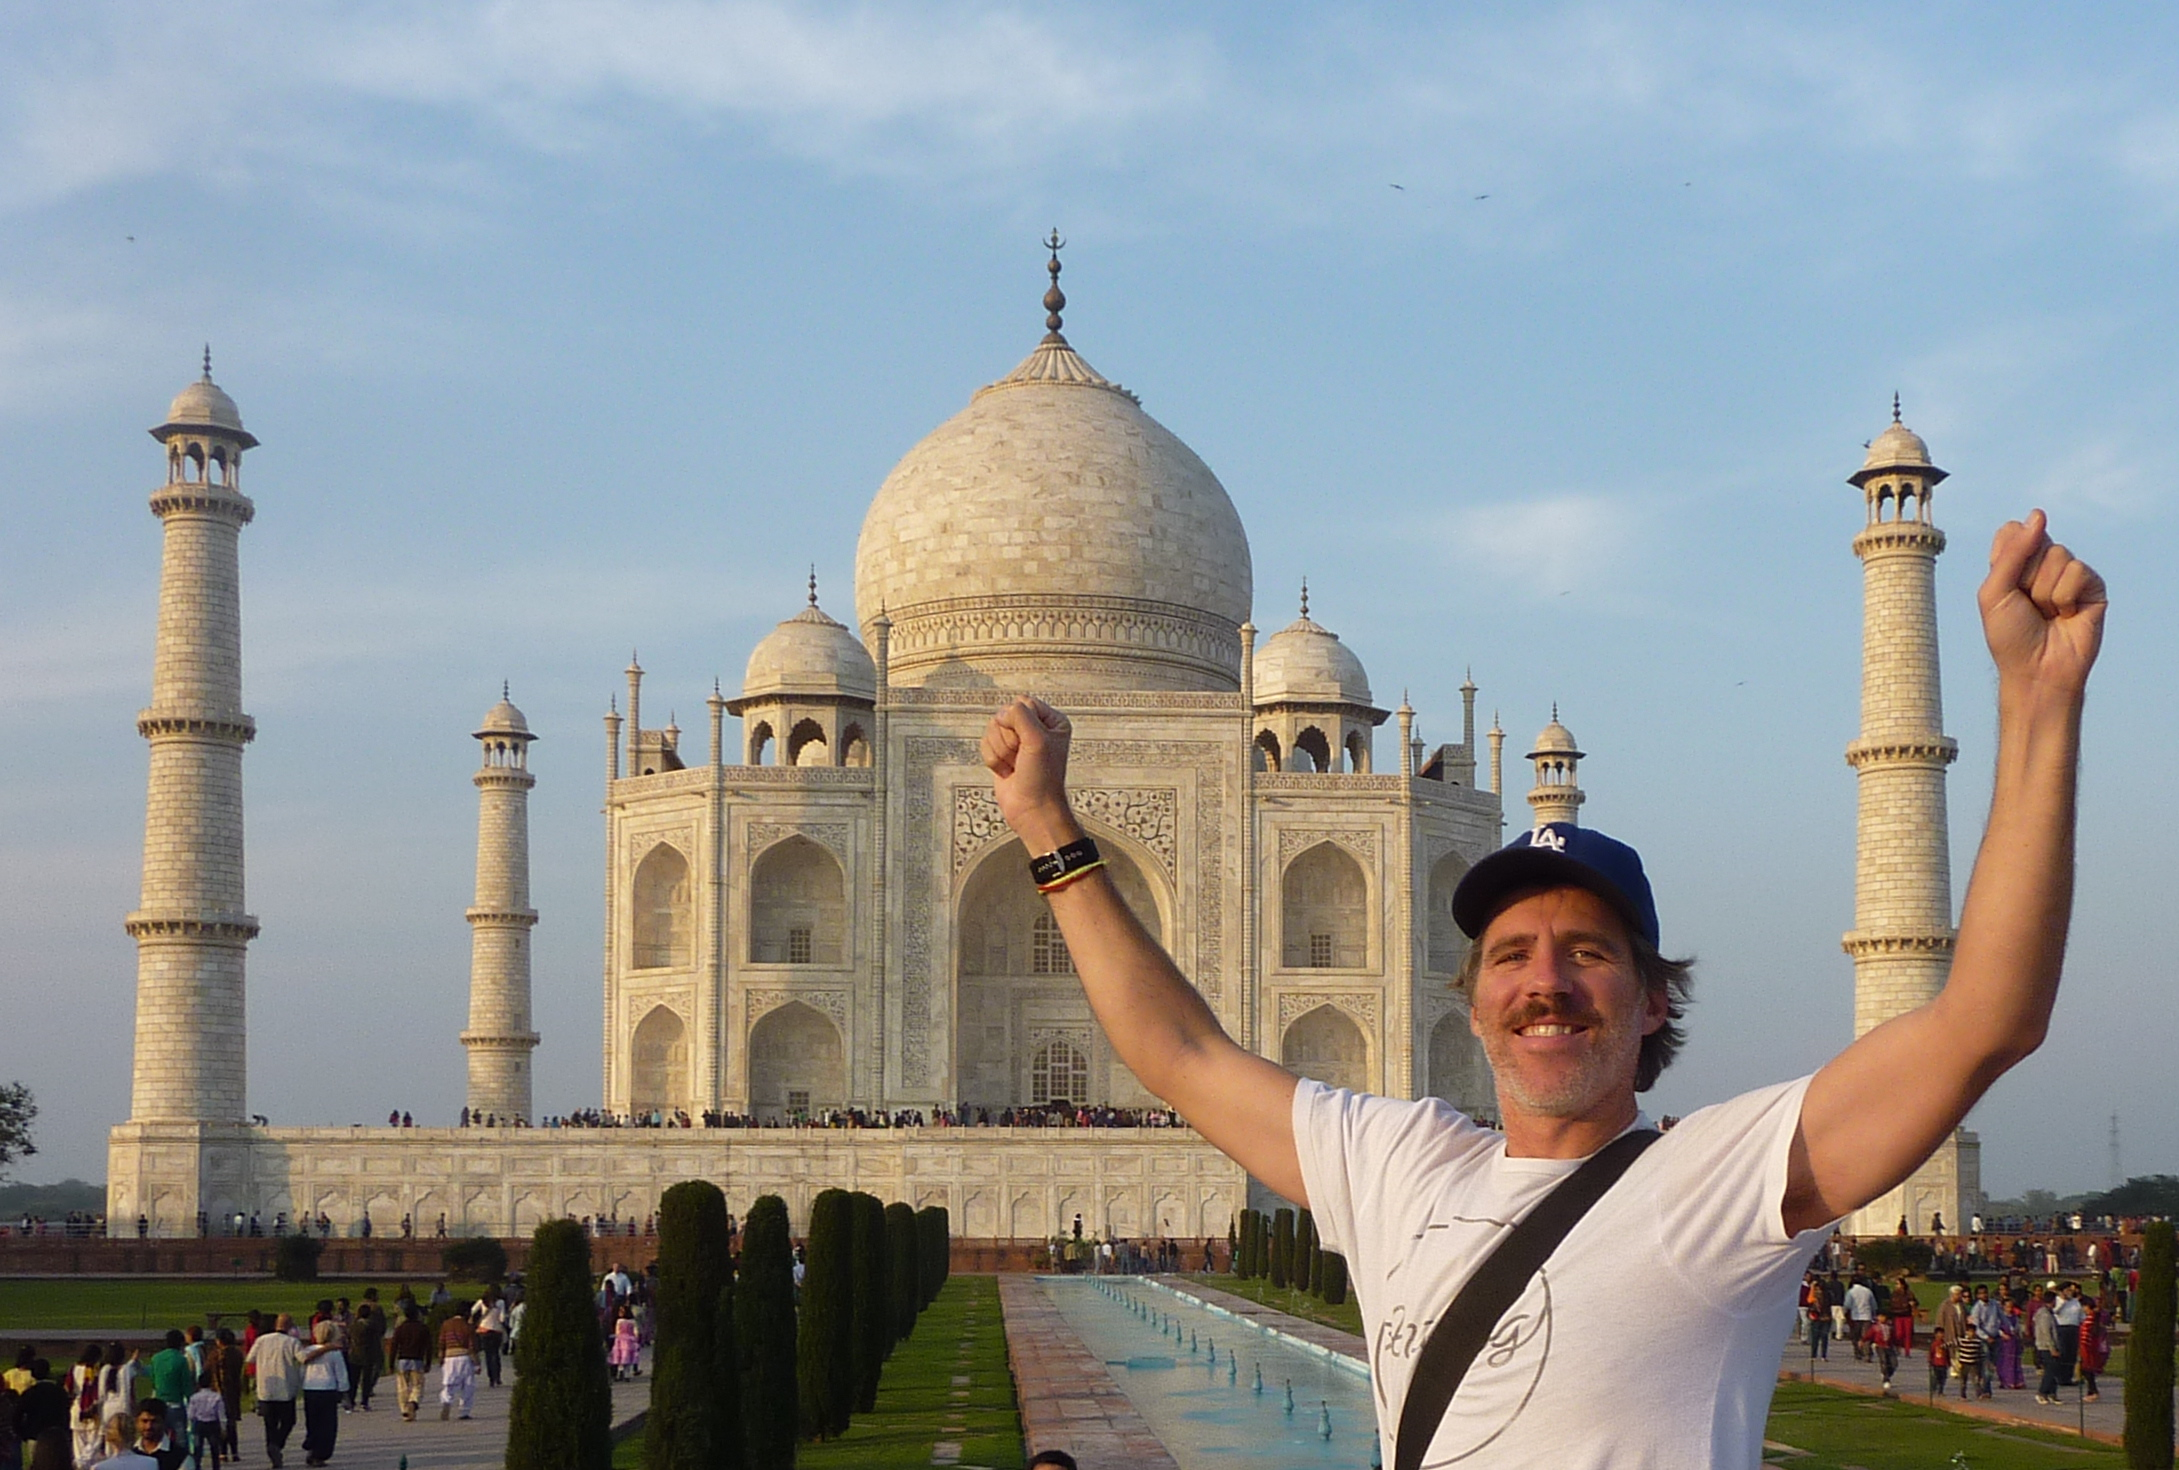 Moustached at the Taj